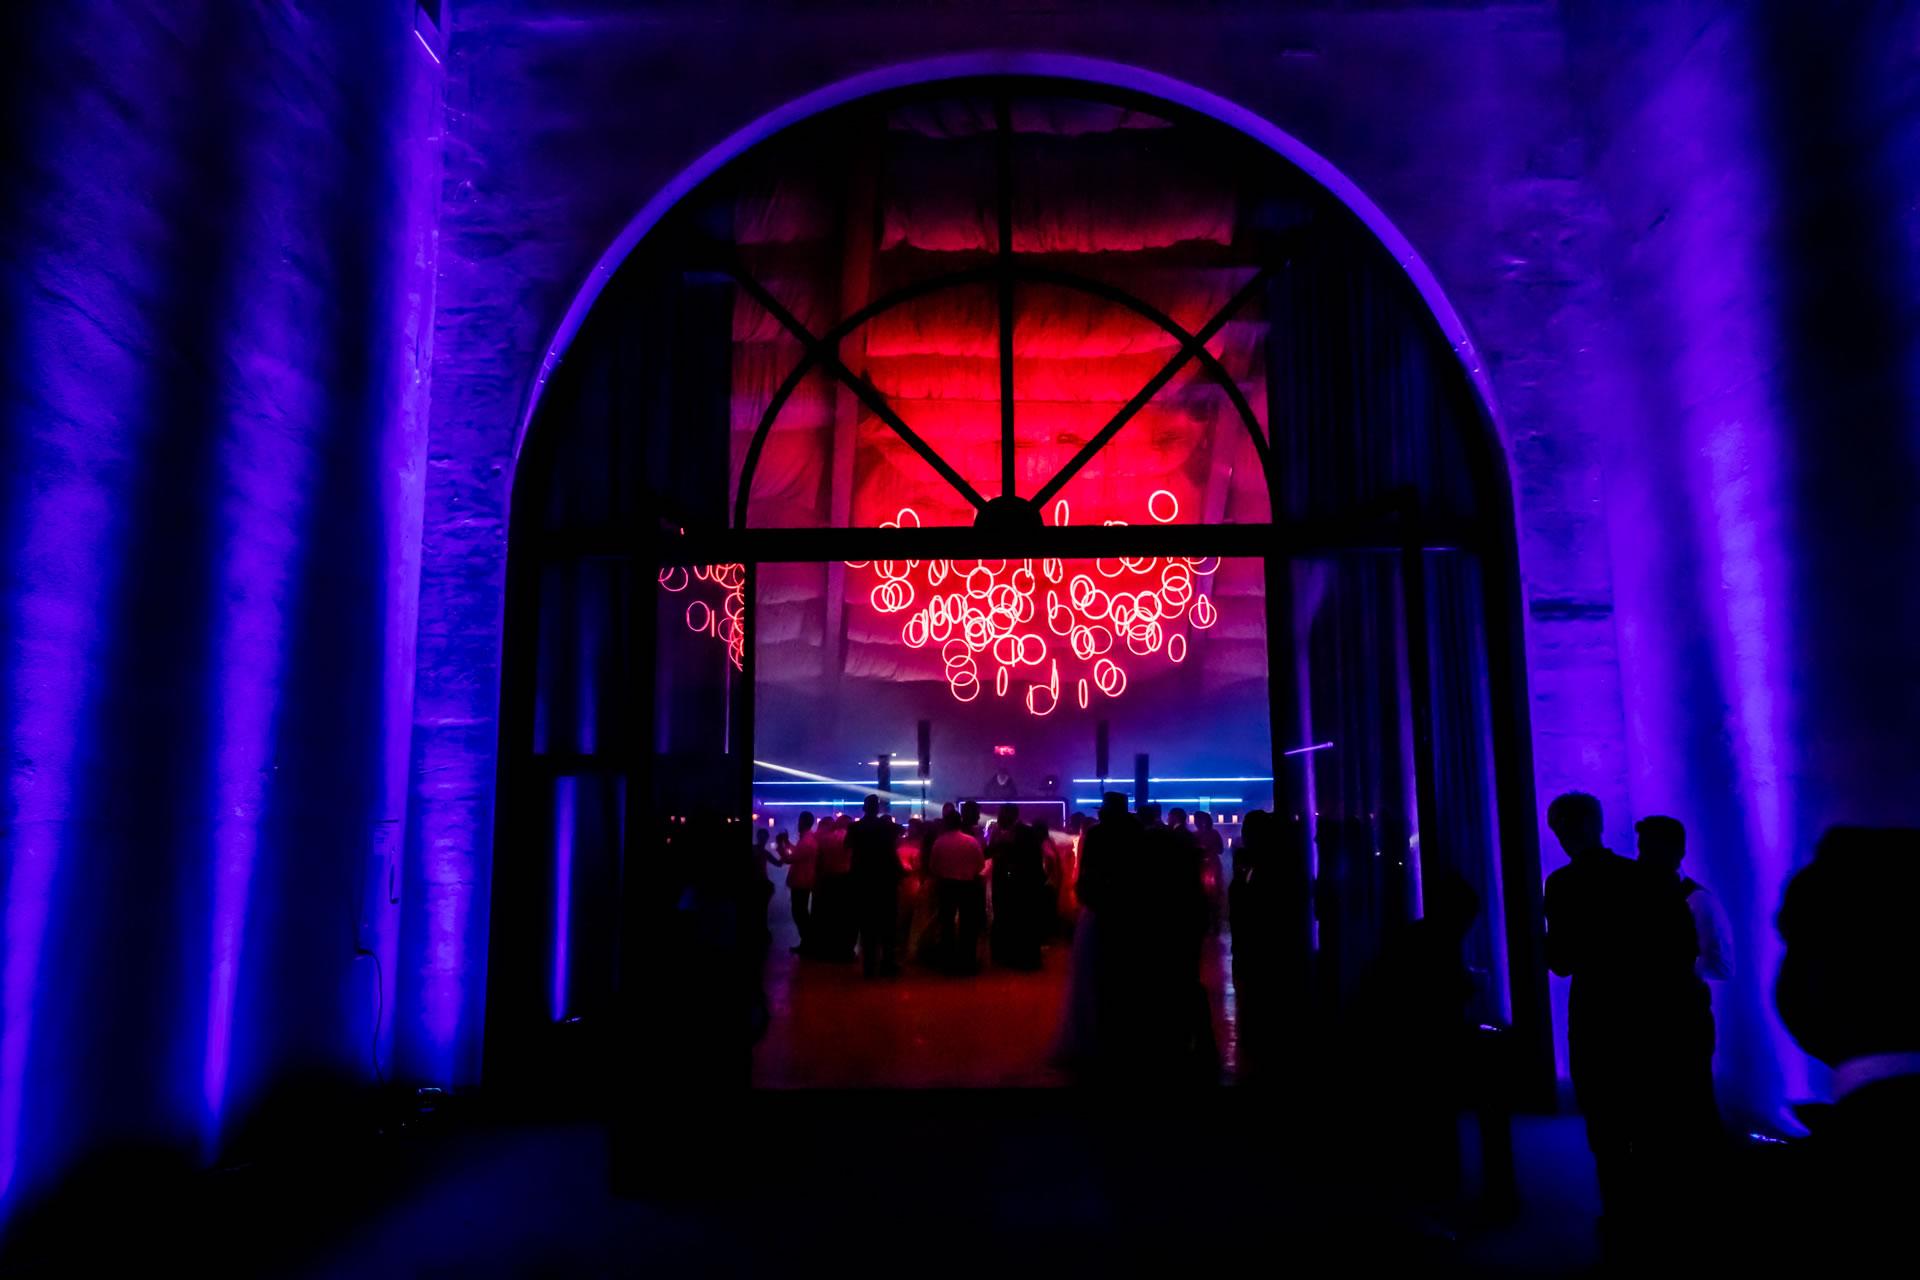 Event - 95 :: Luxury wedding at Il Borro :: Luxury wedding photography - 94 :: Event - 95